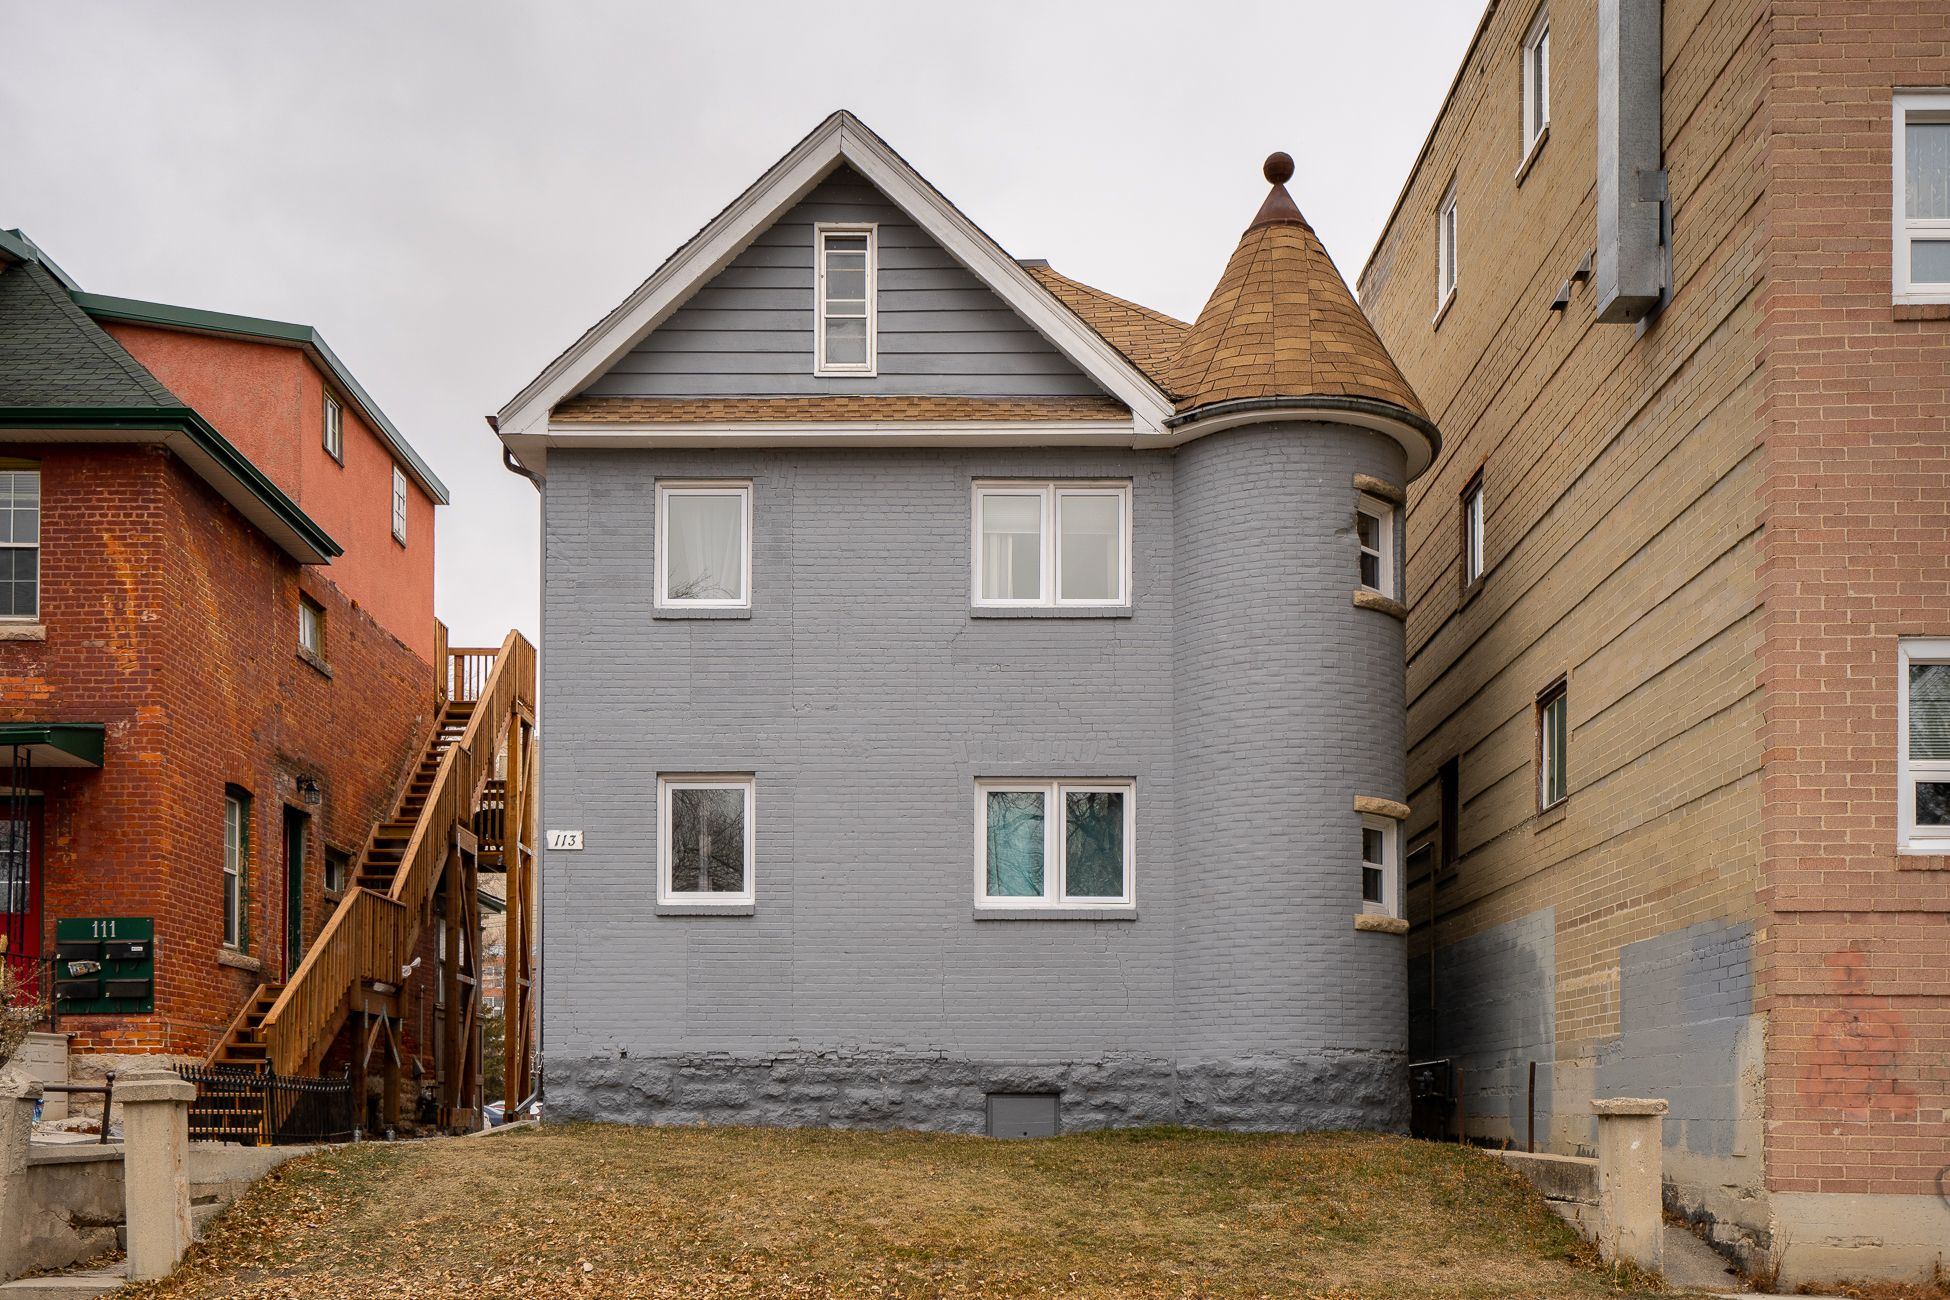 Main Photo: 113 Eugenie Street in Winnipeg: Multi-family for sale (2B)  : MLS®# 202028339